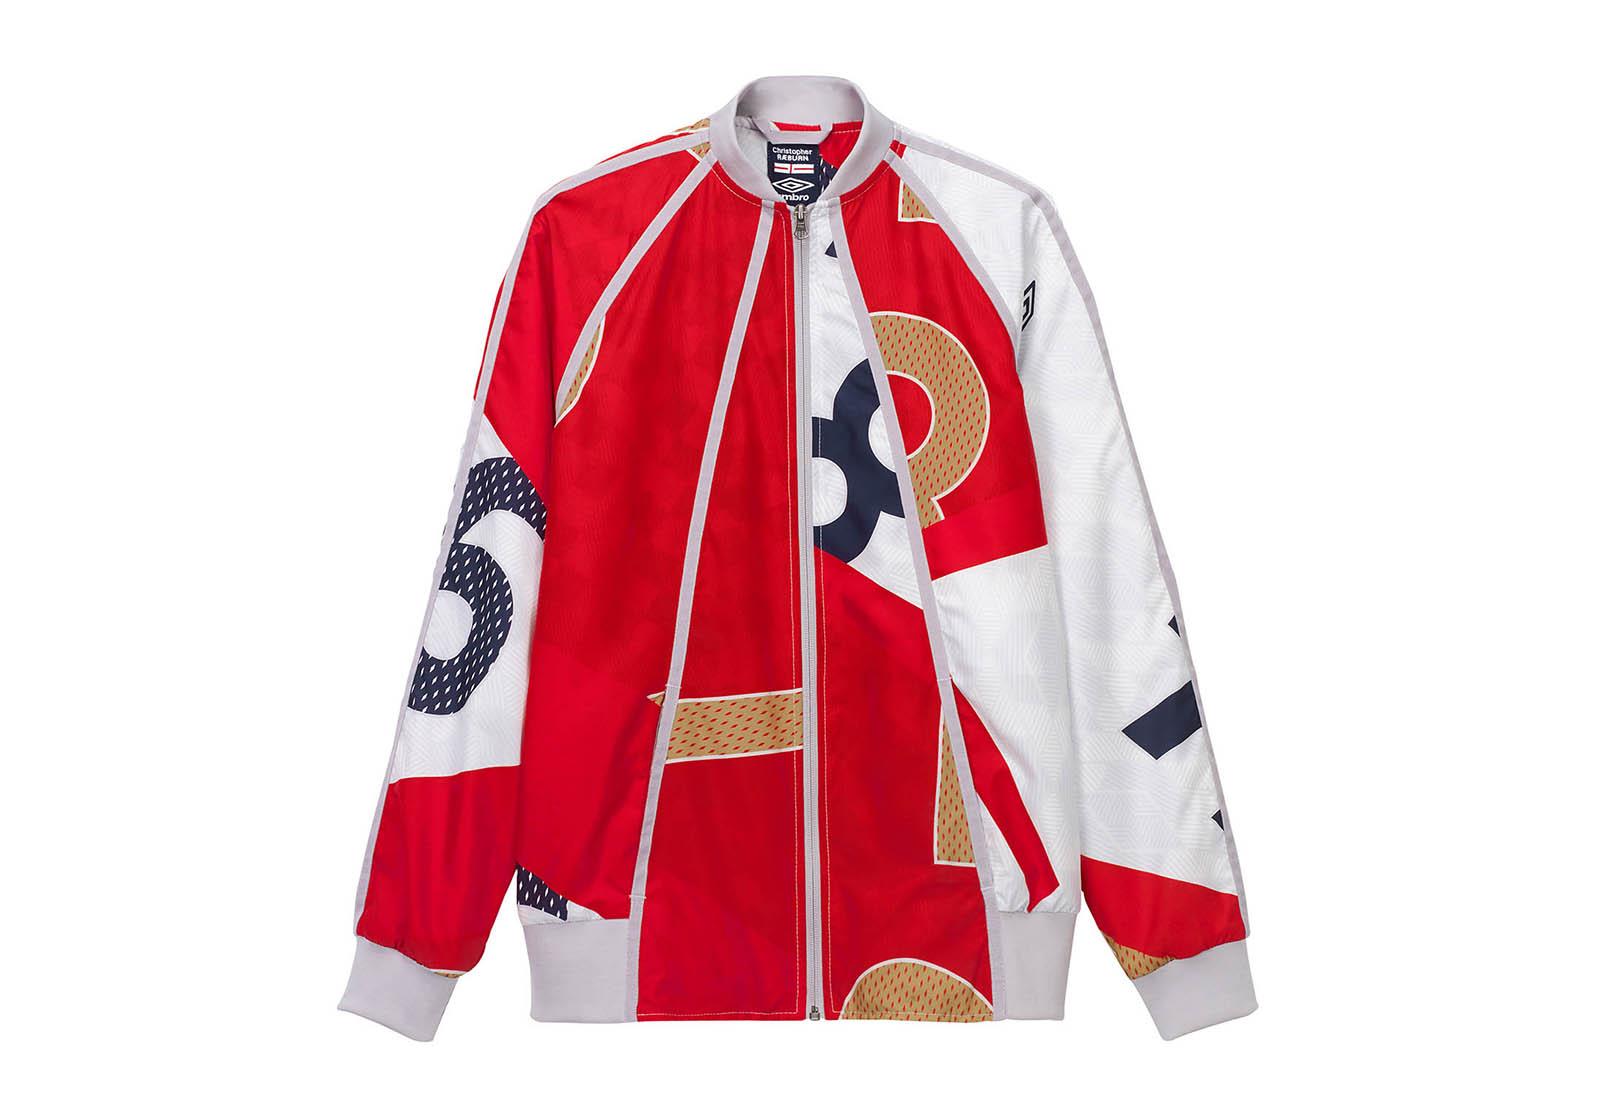 christopher-raeburn-umbro-collaboration-soccerbible-full-collection_0010_umbro-x-christopher-raeburn-remix-bomber-jacket